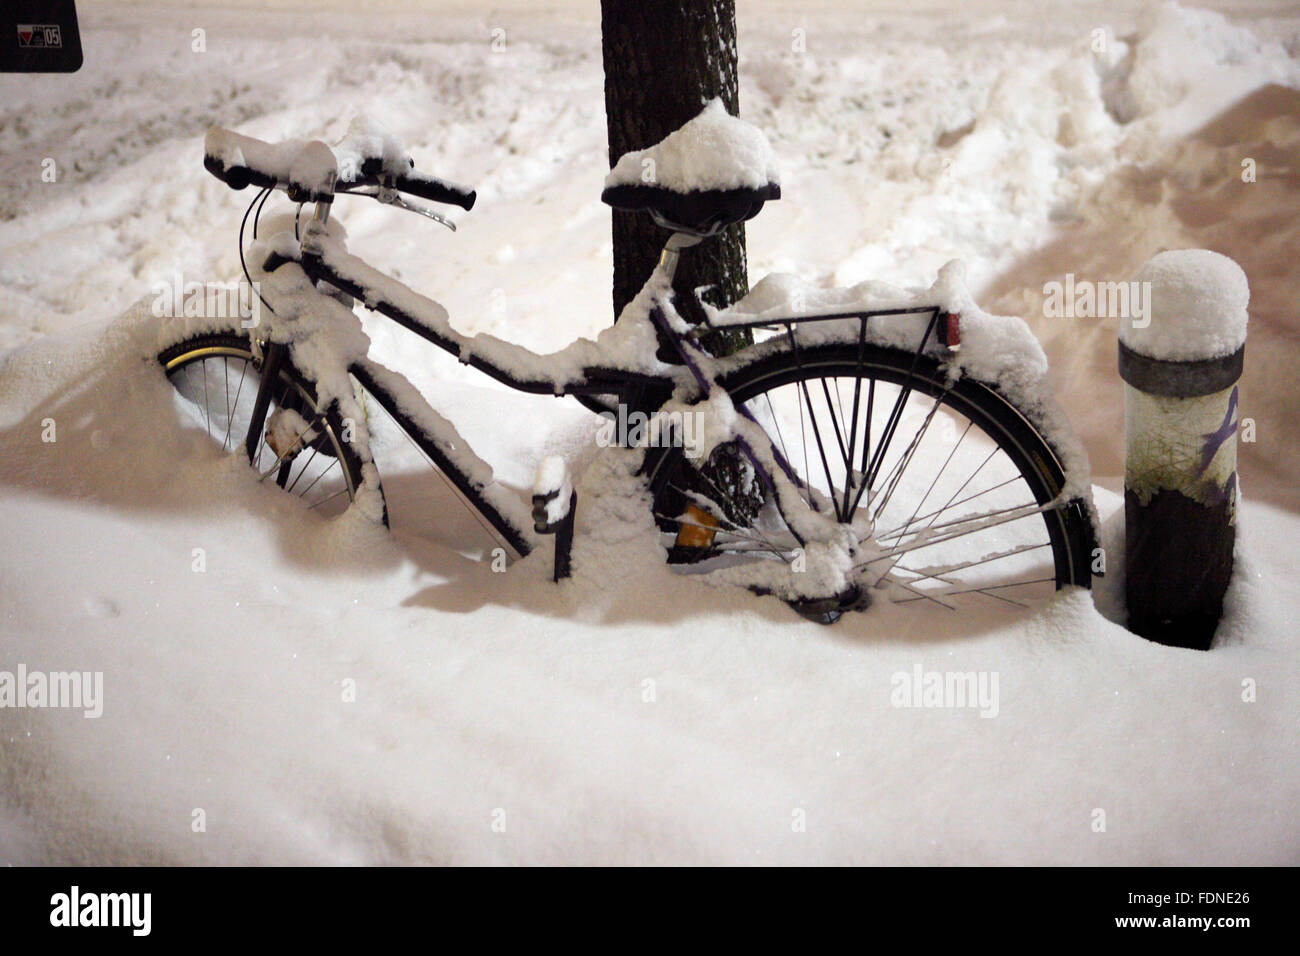 Berlin, Germany, Bicycle is snowed in - Stock Image